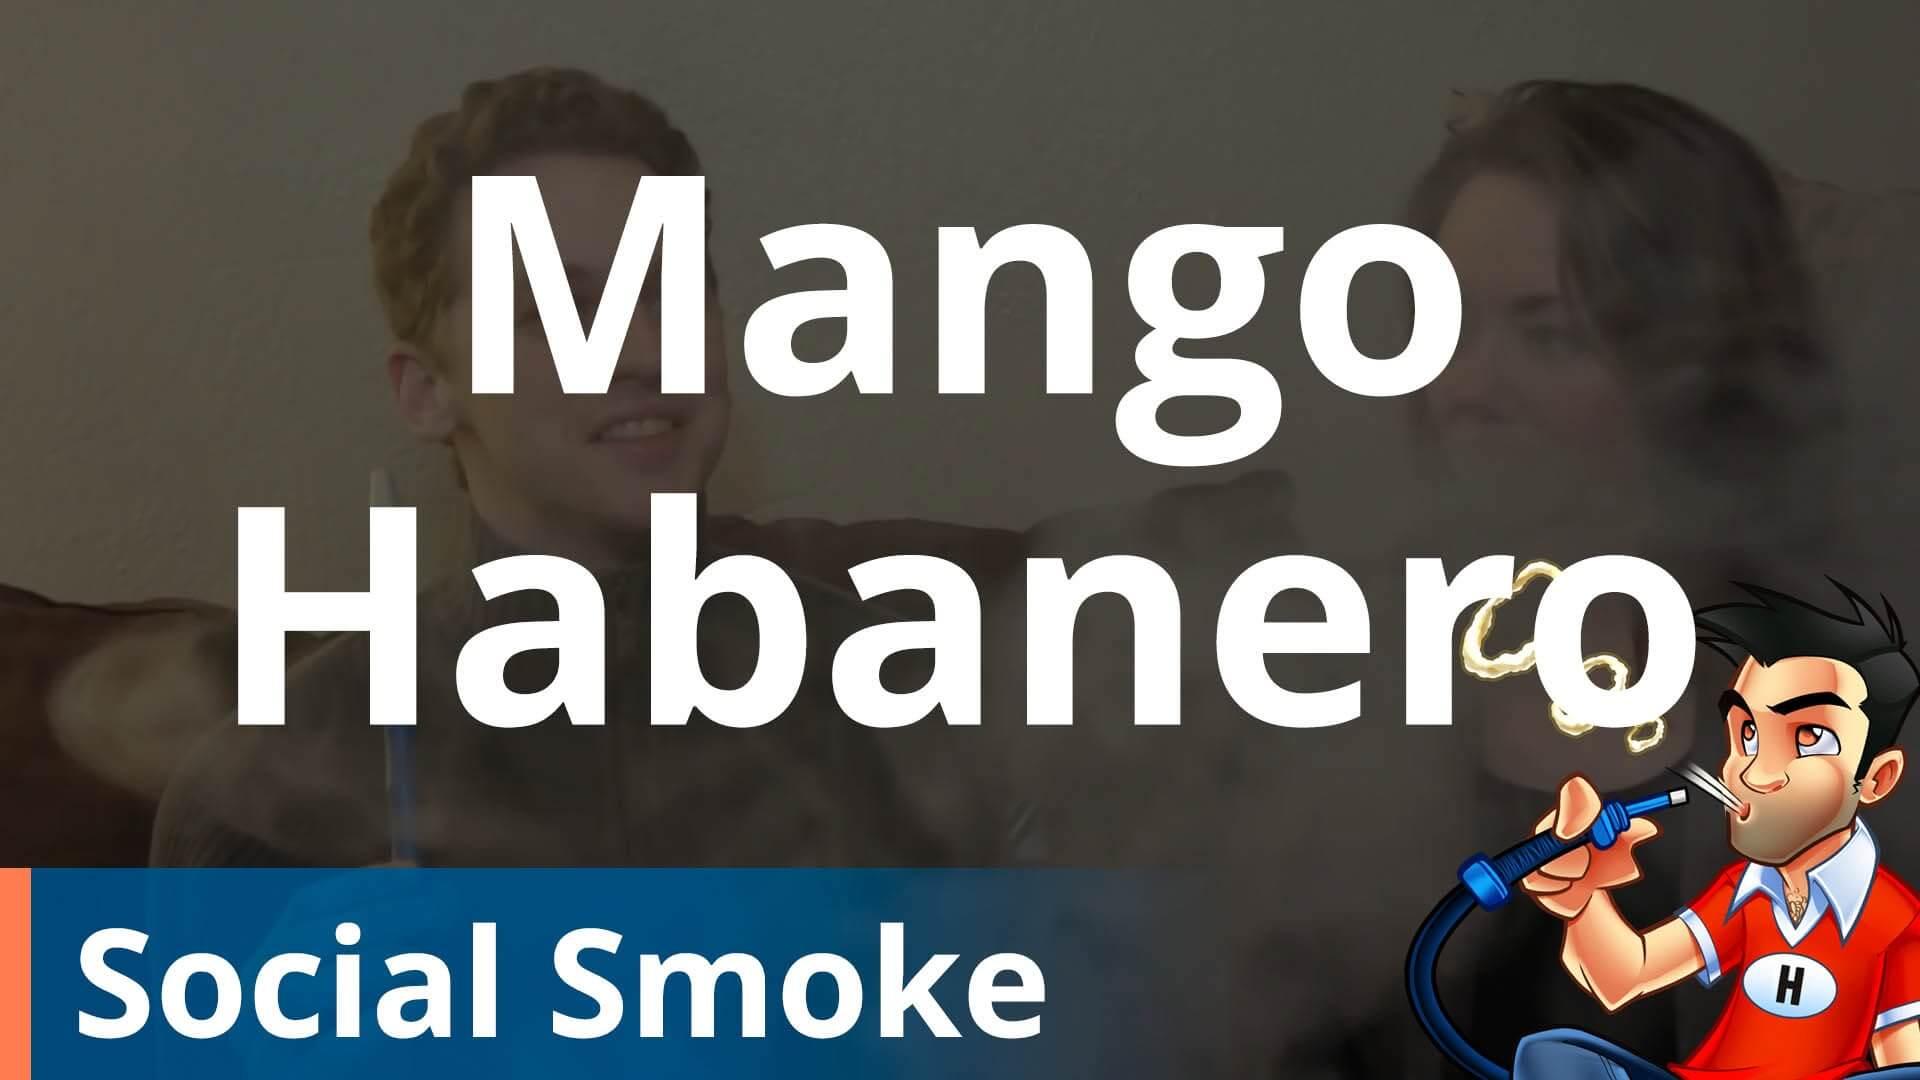 Social Smoke Mango Habanero Shisha Review